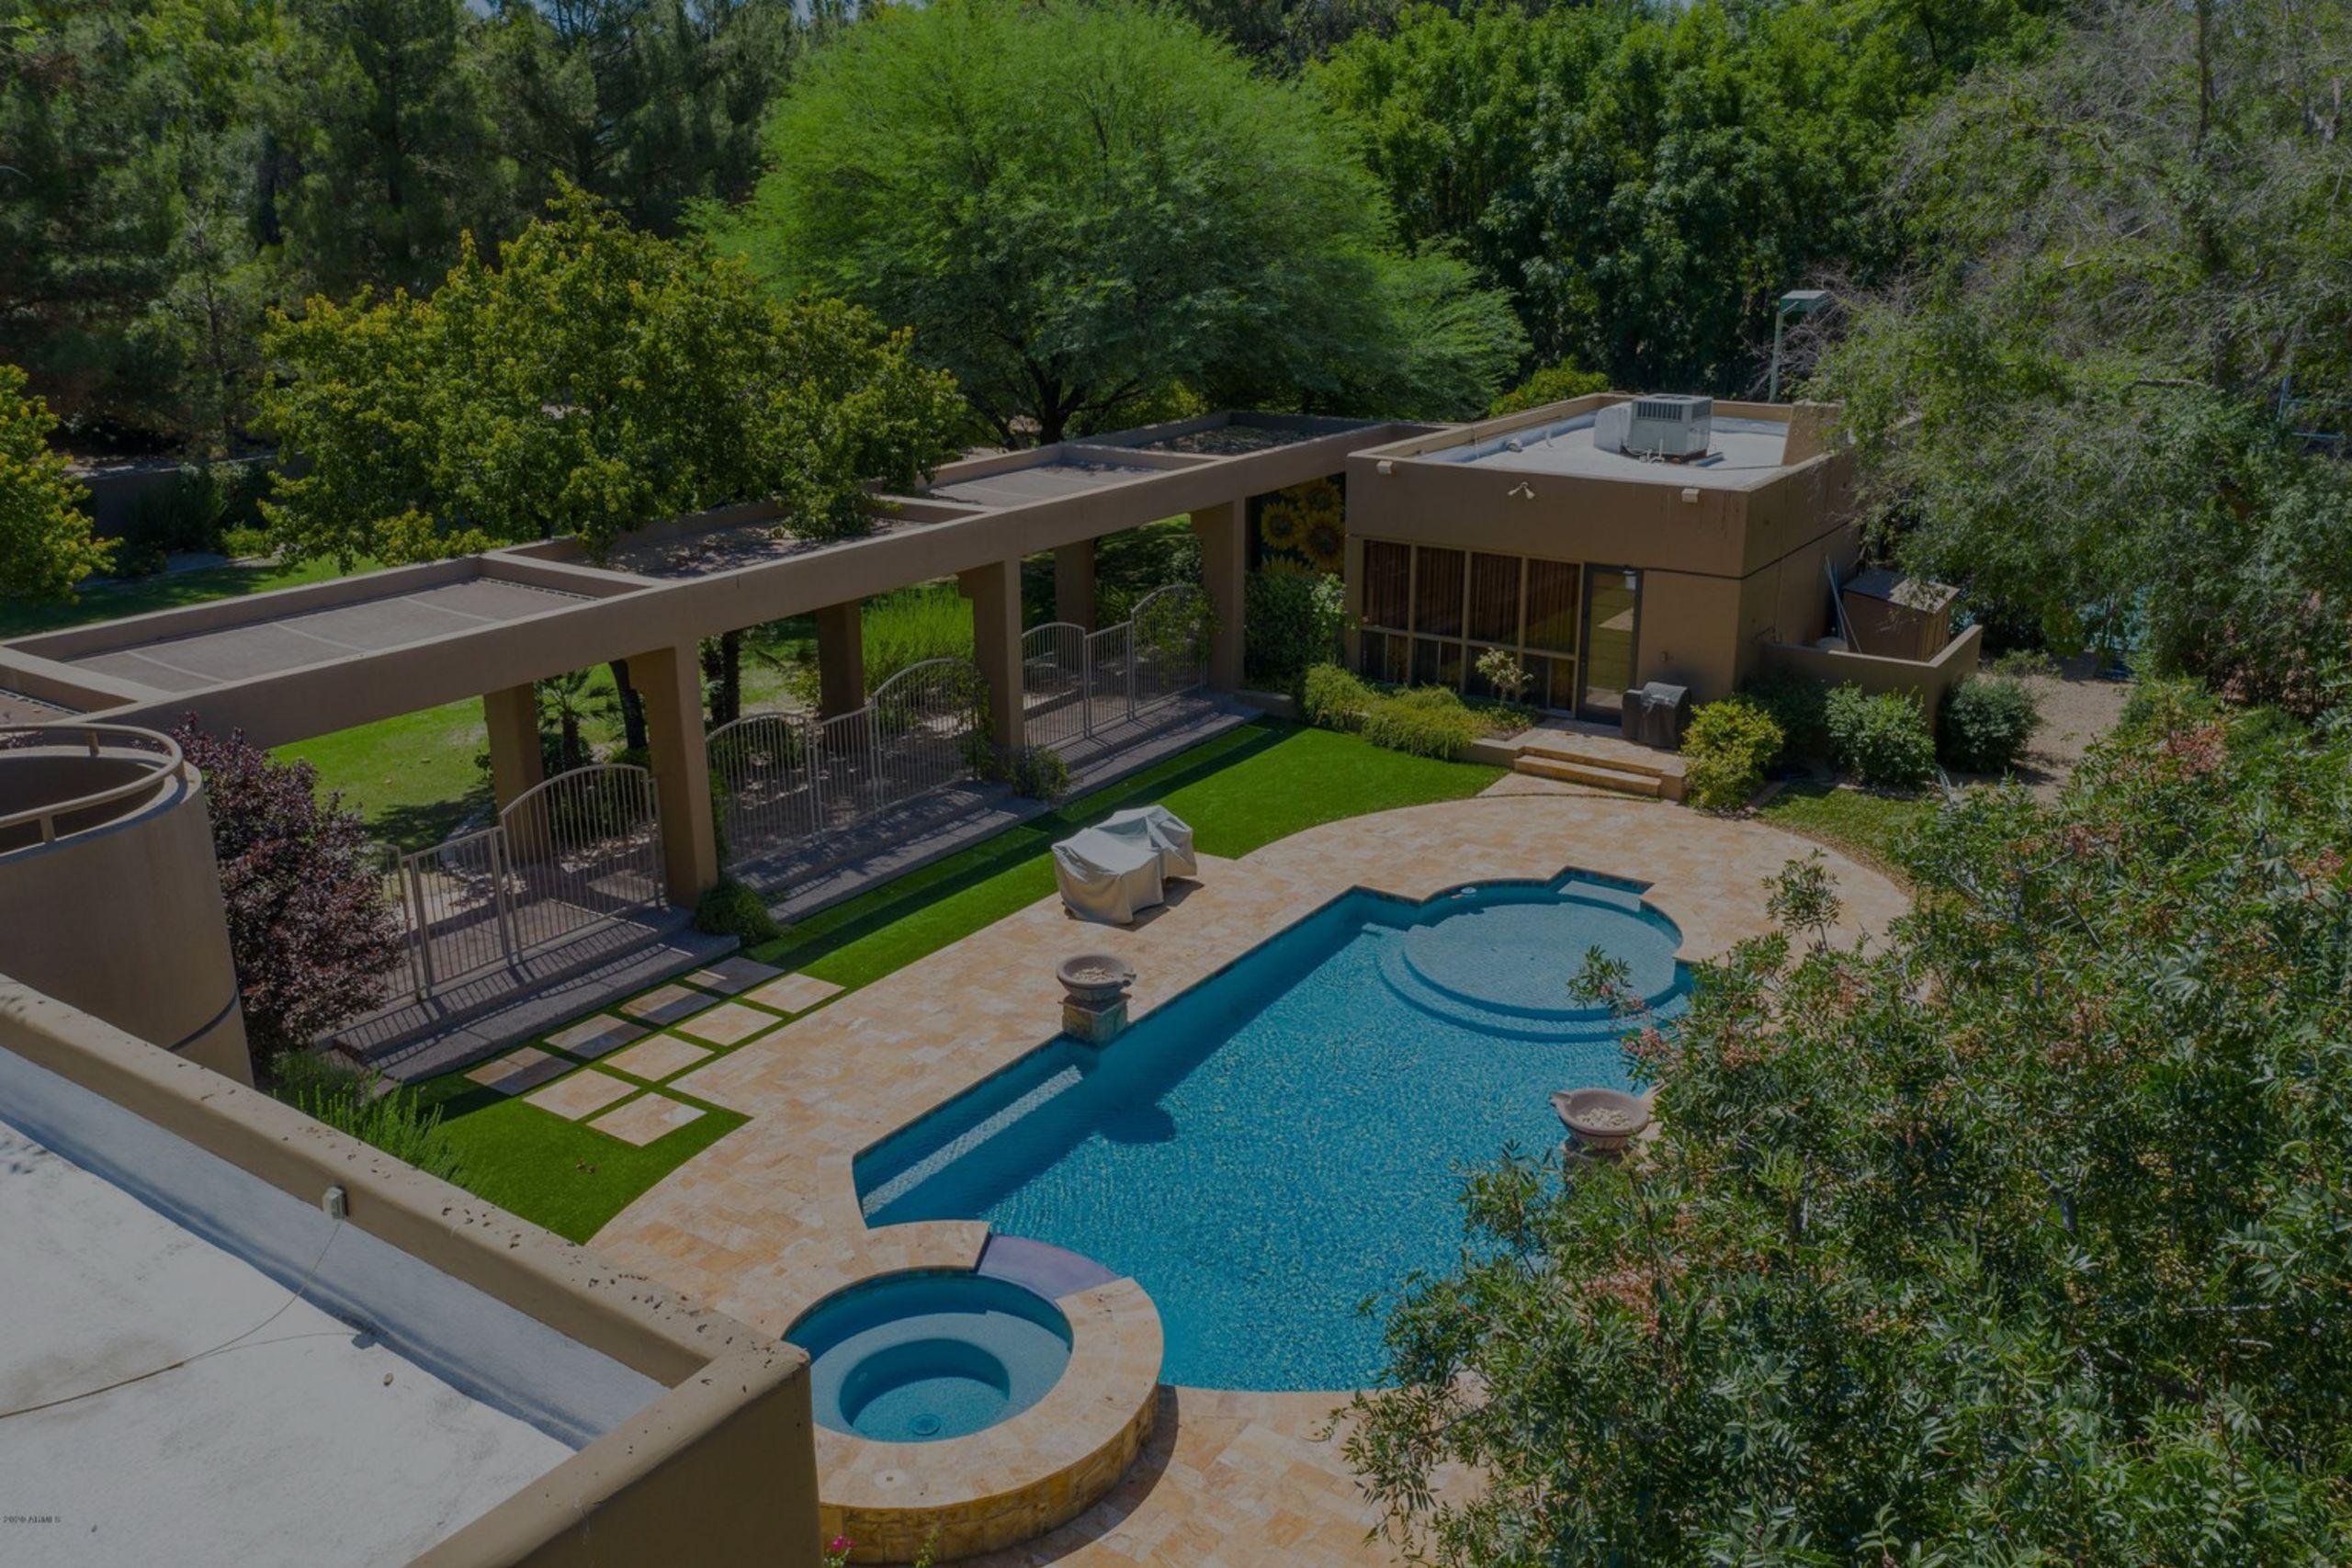 SOLD! Biltmore Bartlett Estates Stunning Home on Over an Acre